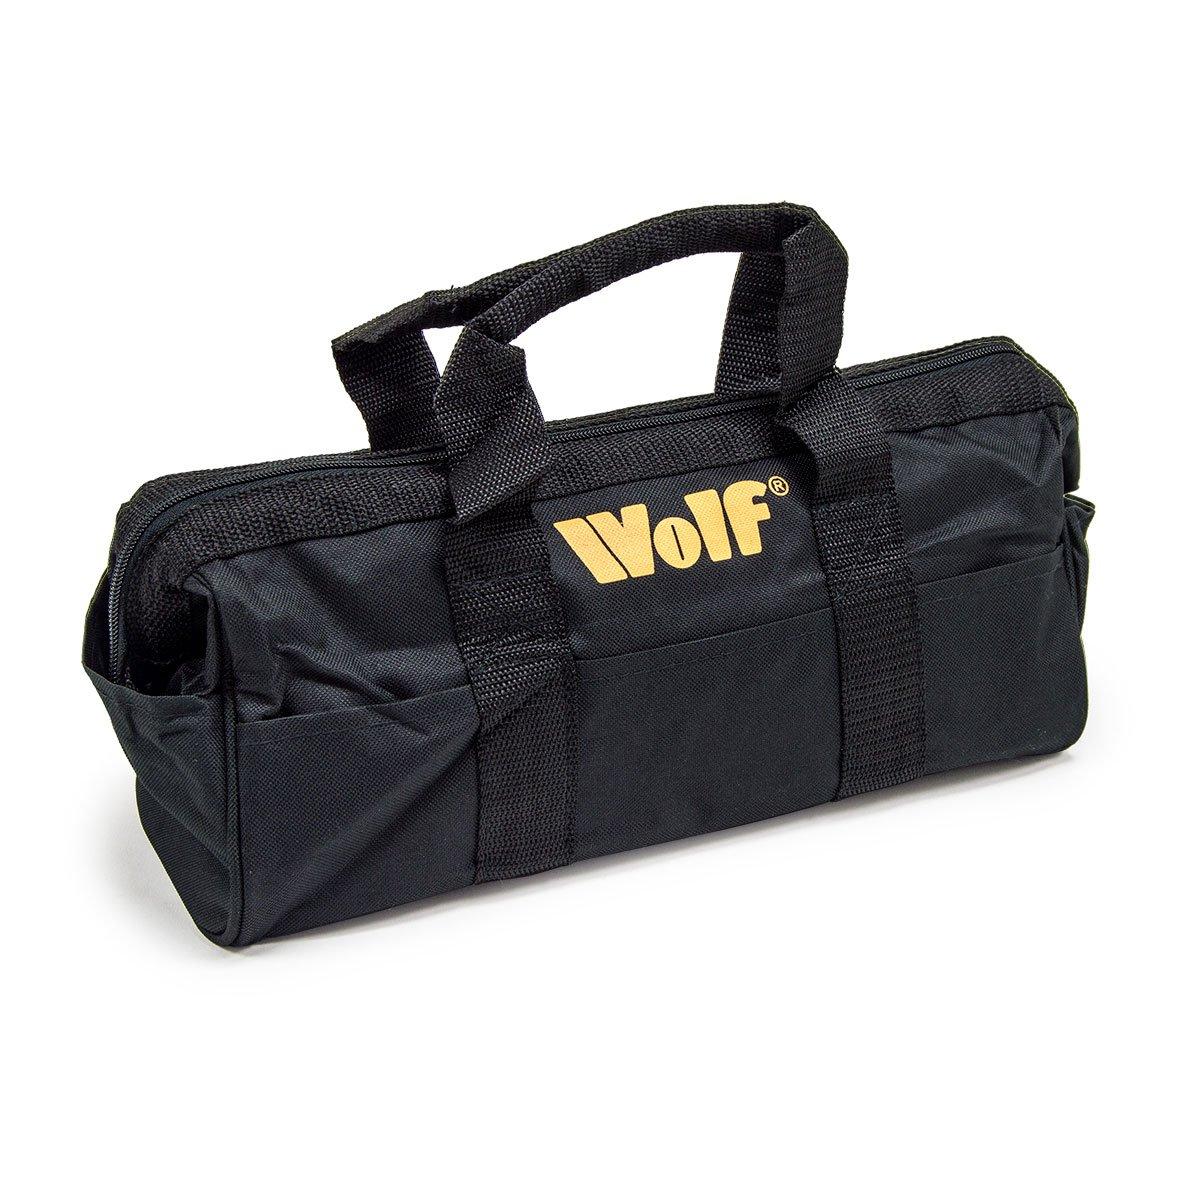 Wolf Heavy Duty Zipped Tool Bag 360x 140 x150mm (LxWxH)